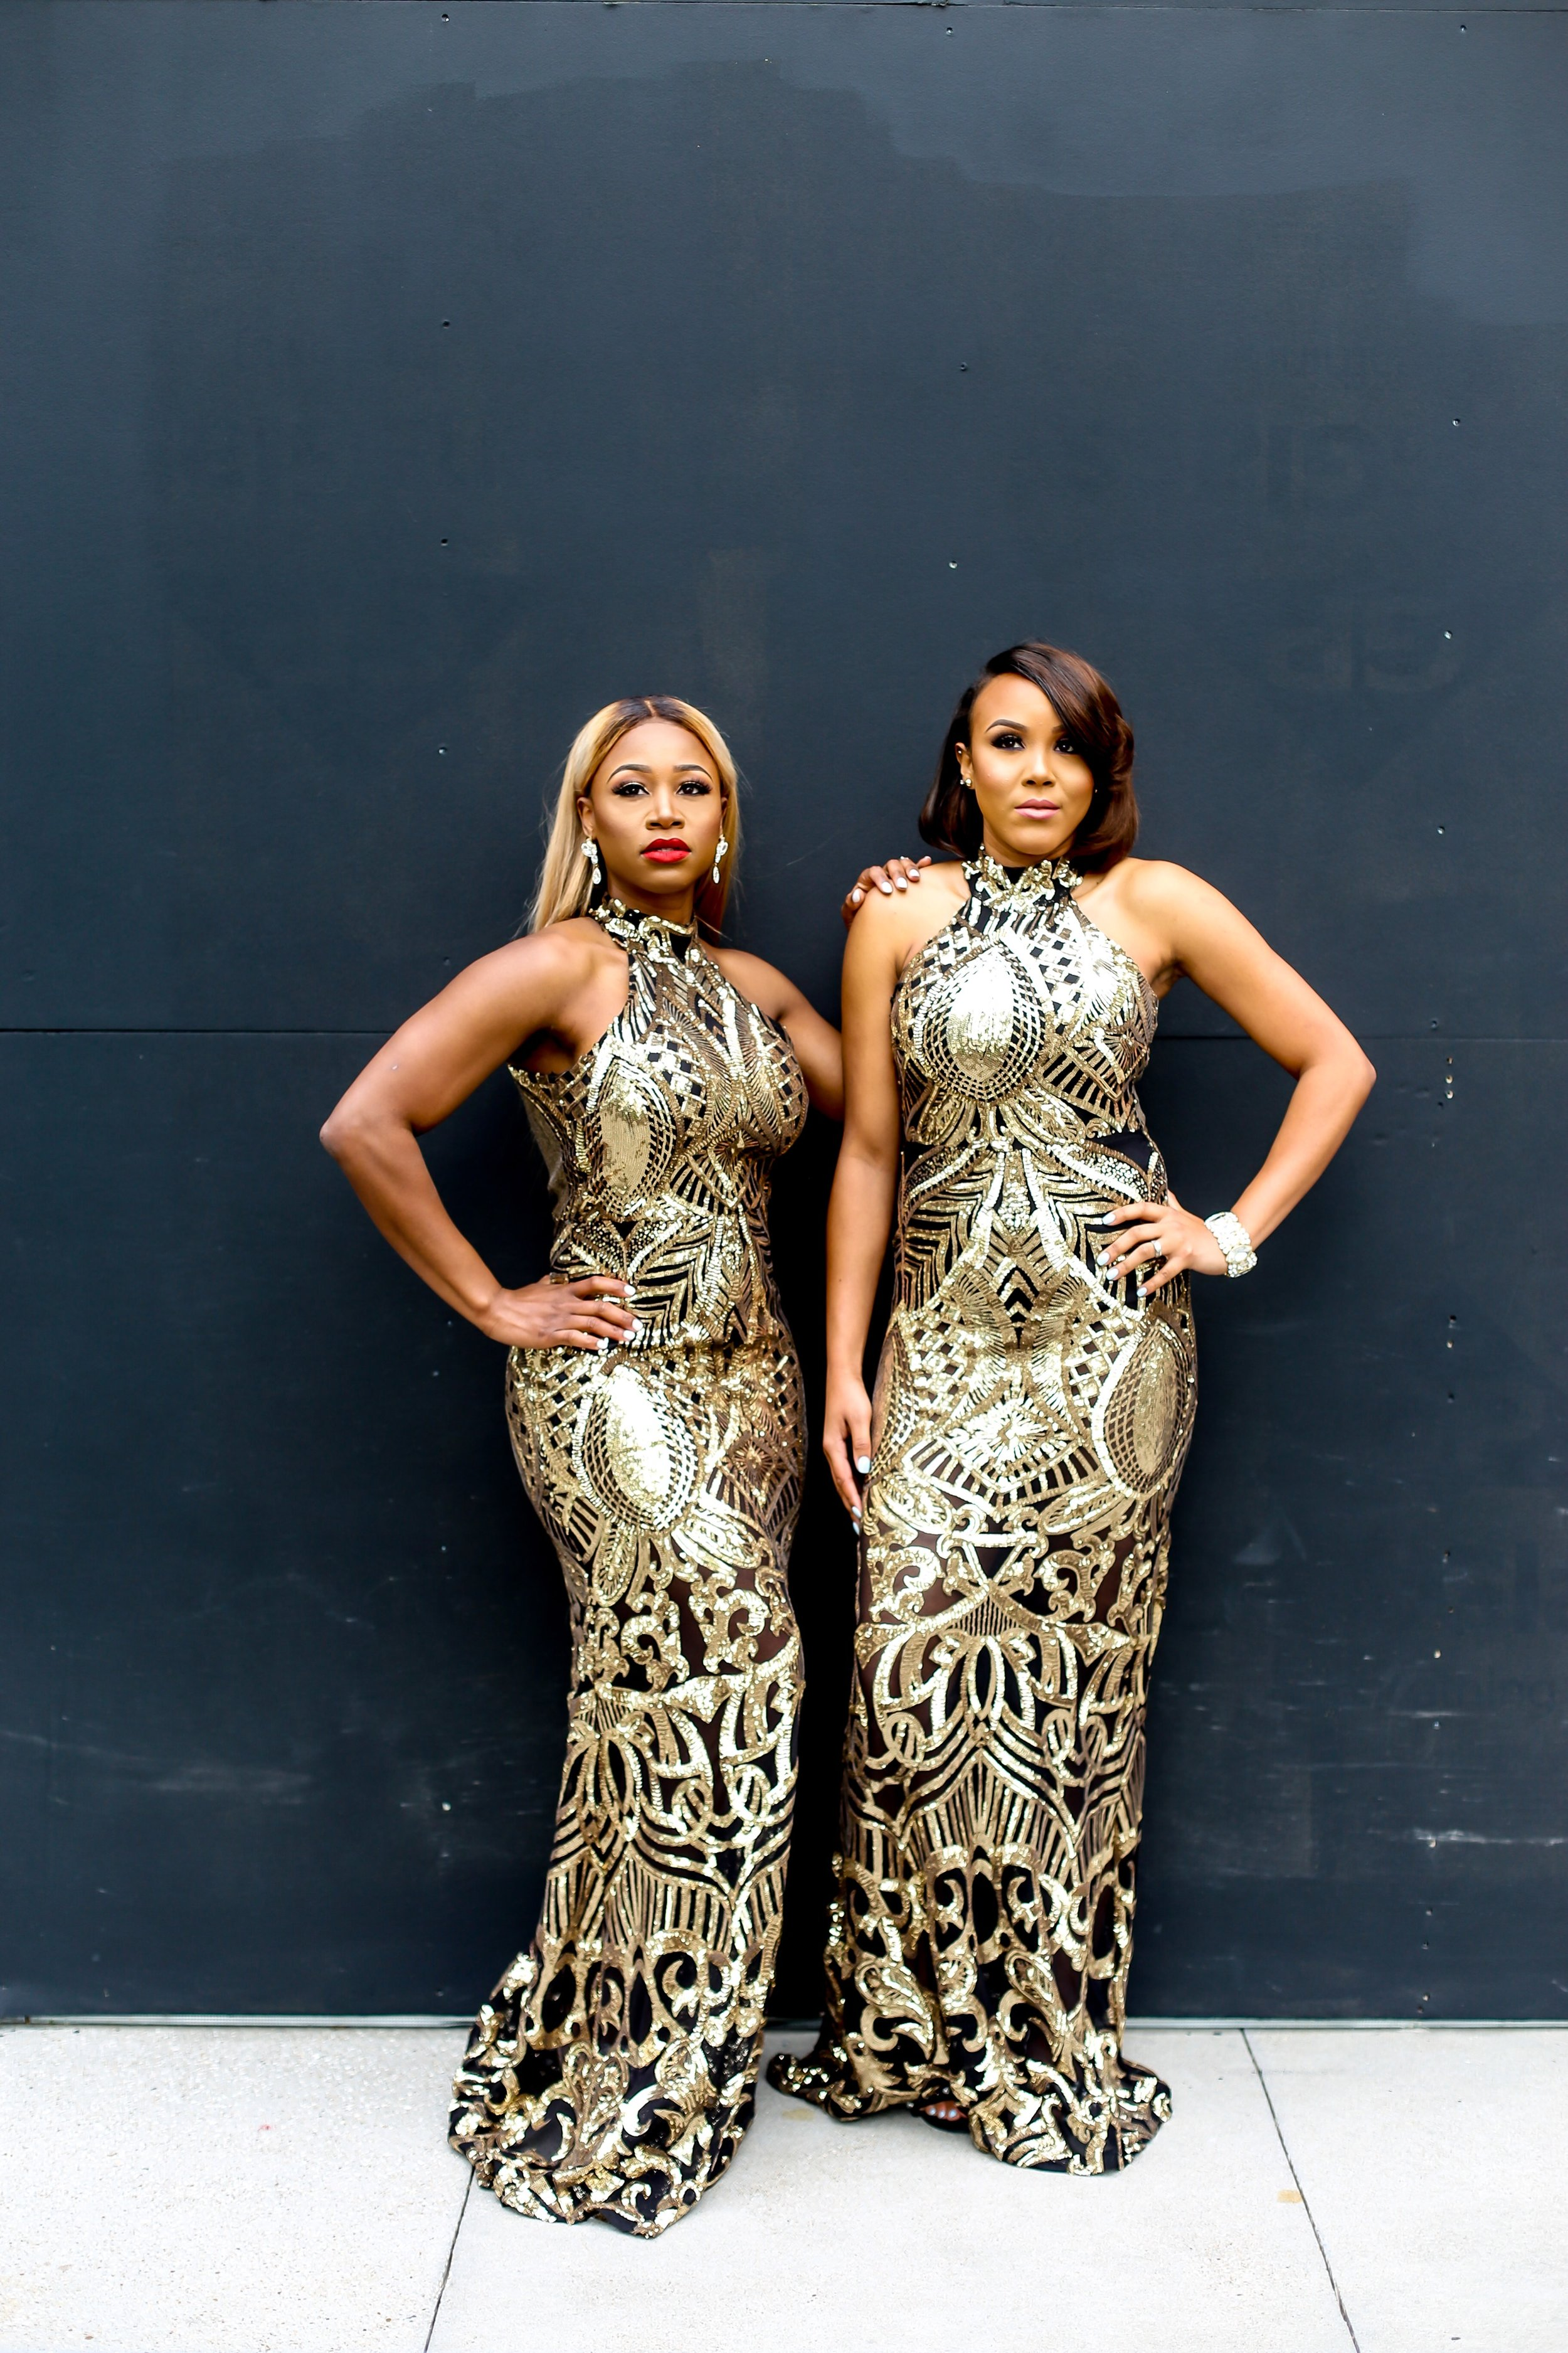 The Glam Girls